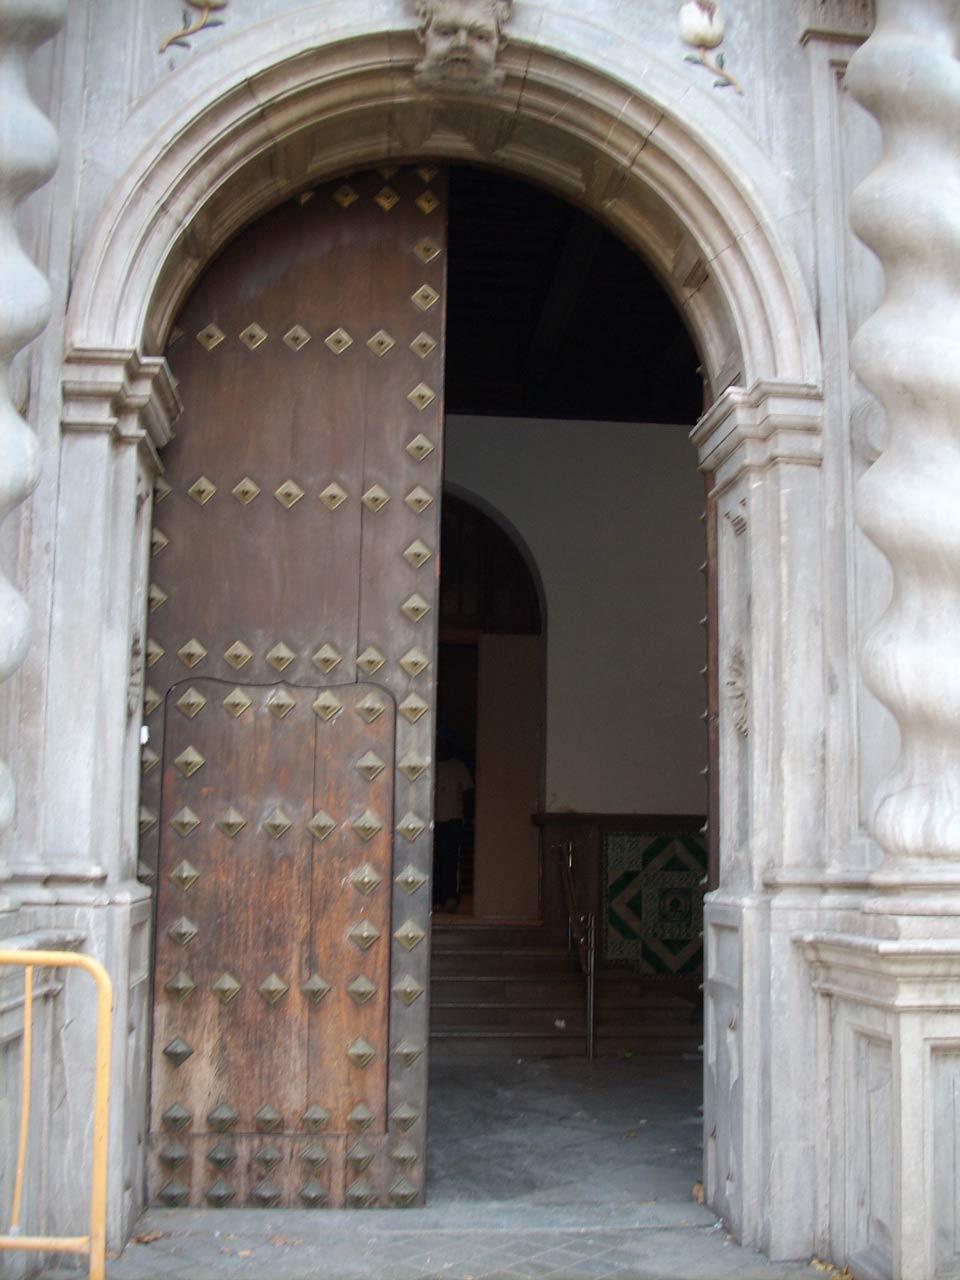 Portón antiguo deteriorado